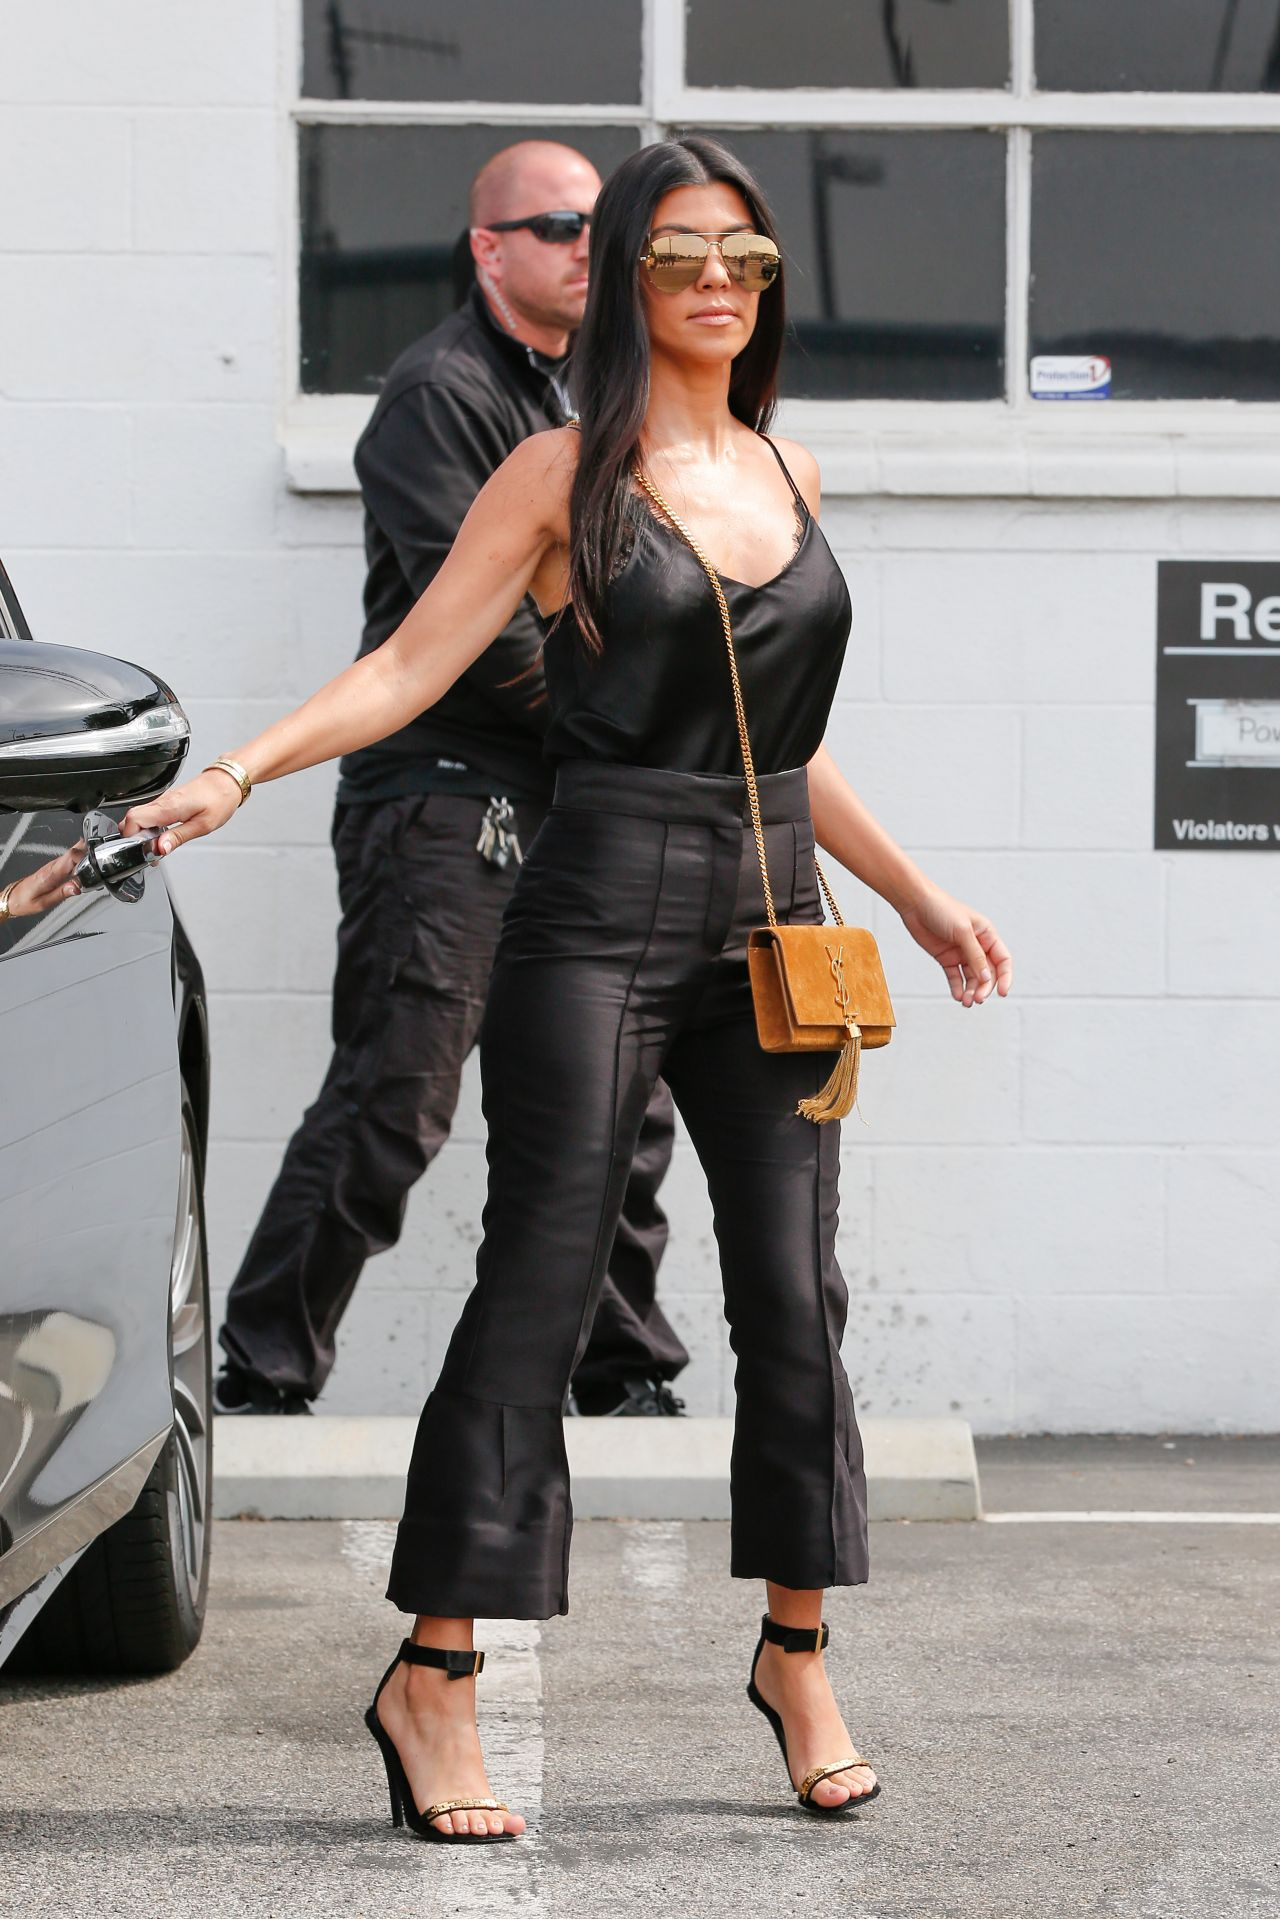 Kourtney Kardashian Classy Fashion Slips Out Of The Studio In Van Nuys 6 10 2016